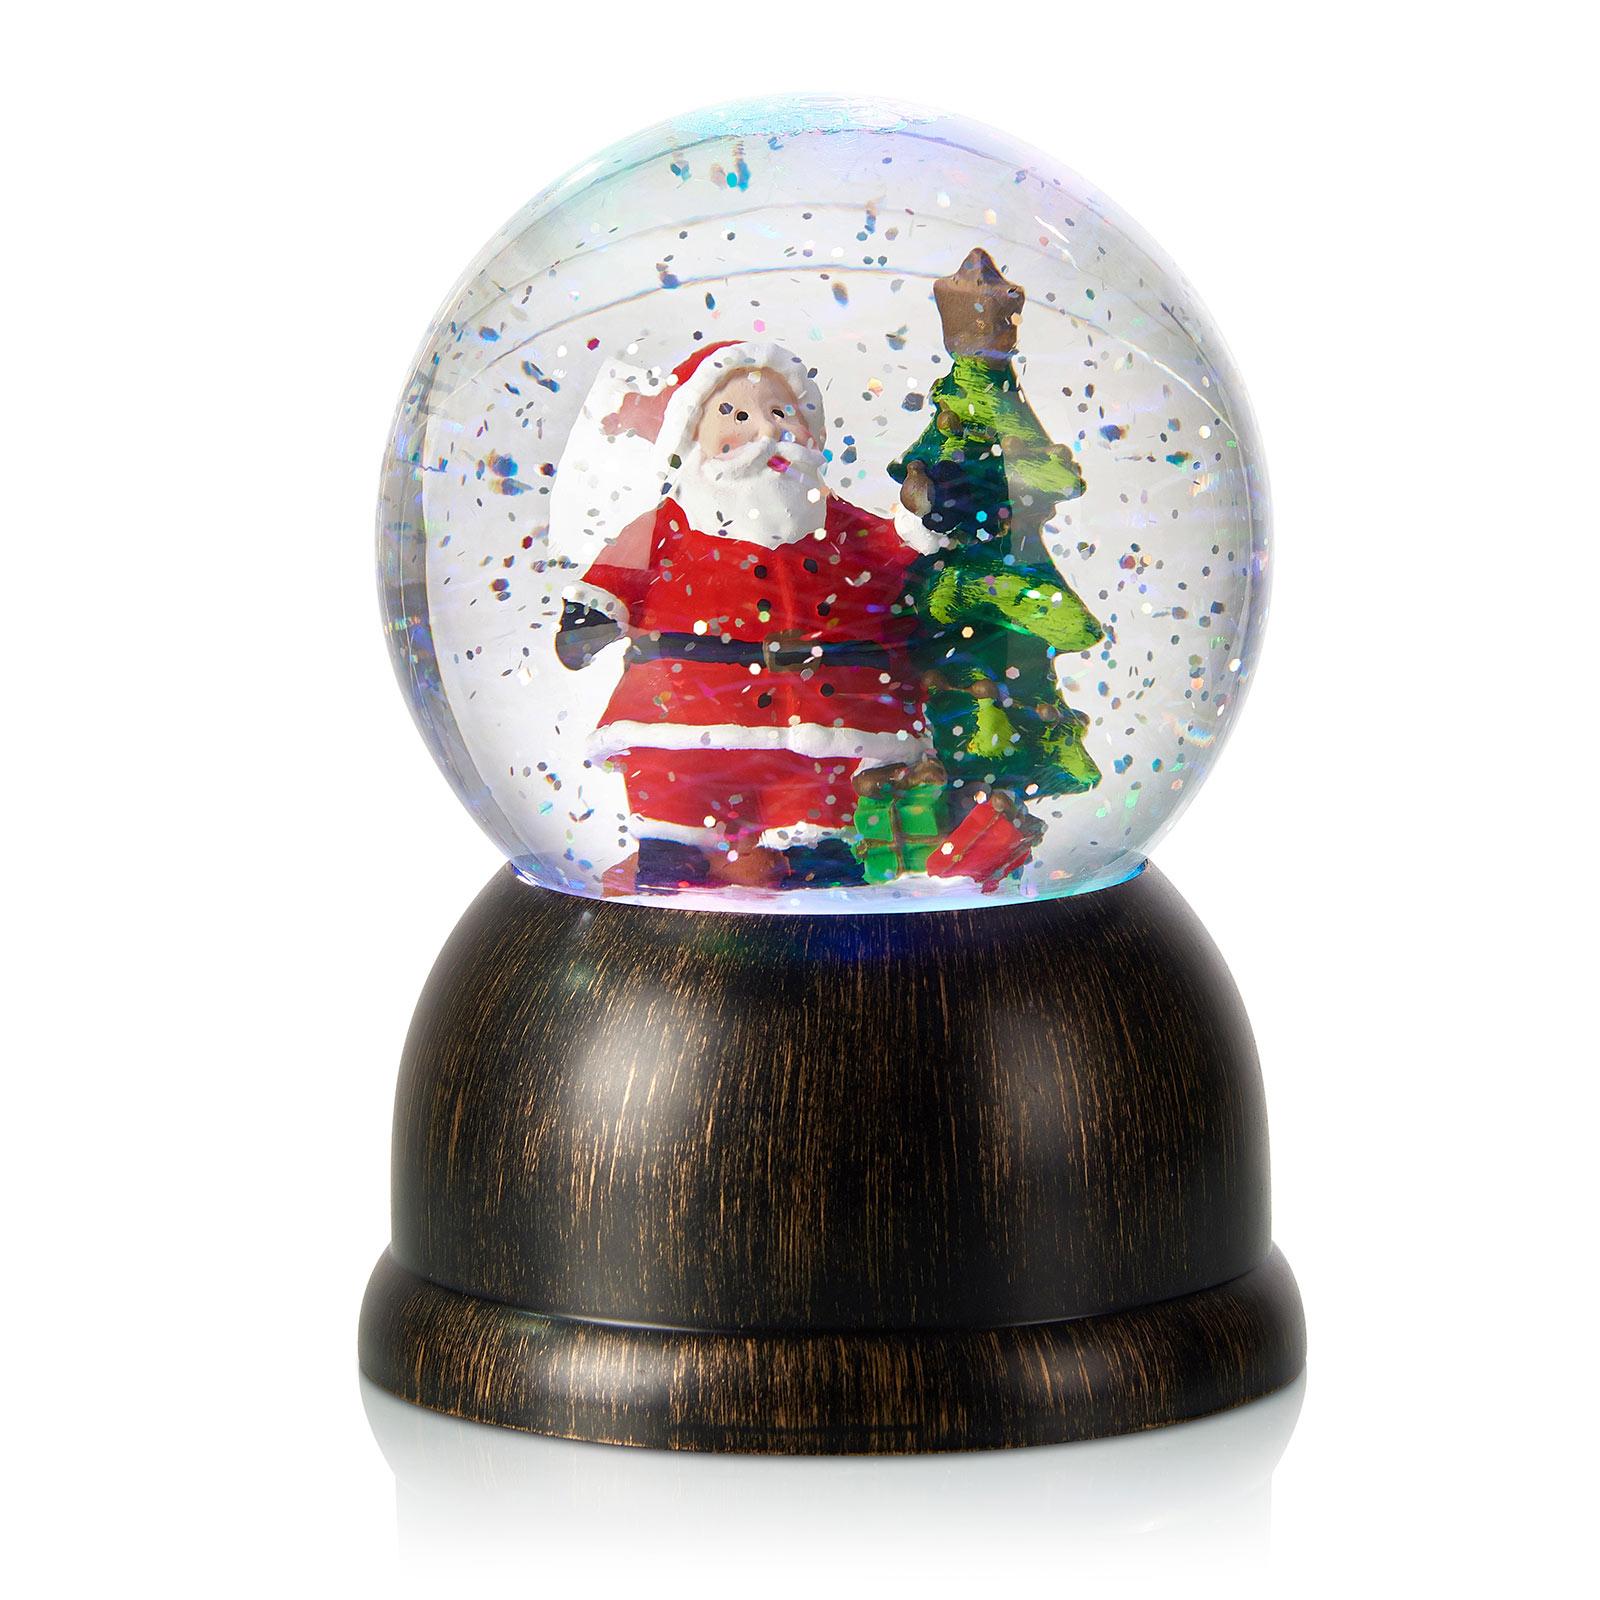 LED sneeuwbol Max met kerstman, brons